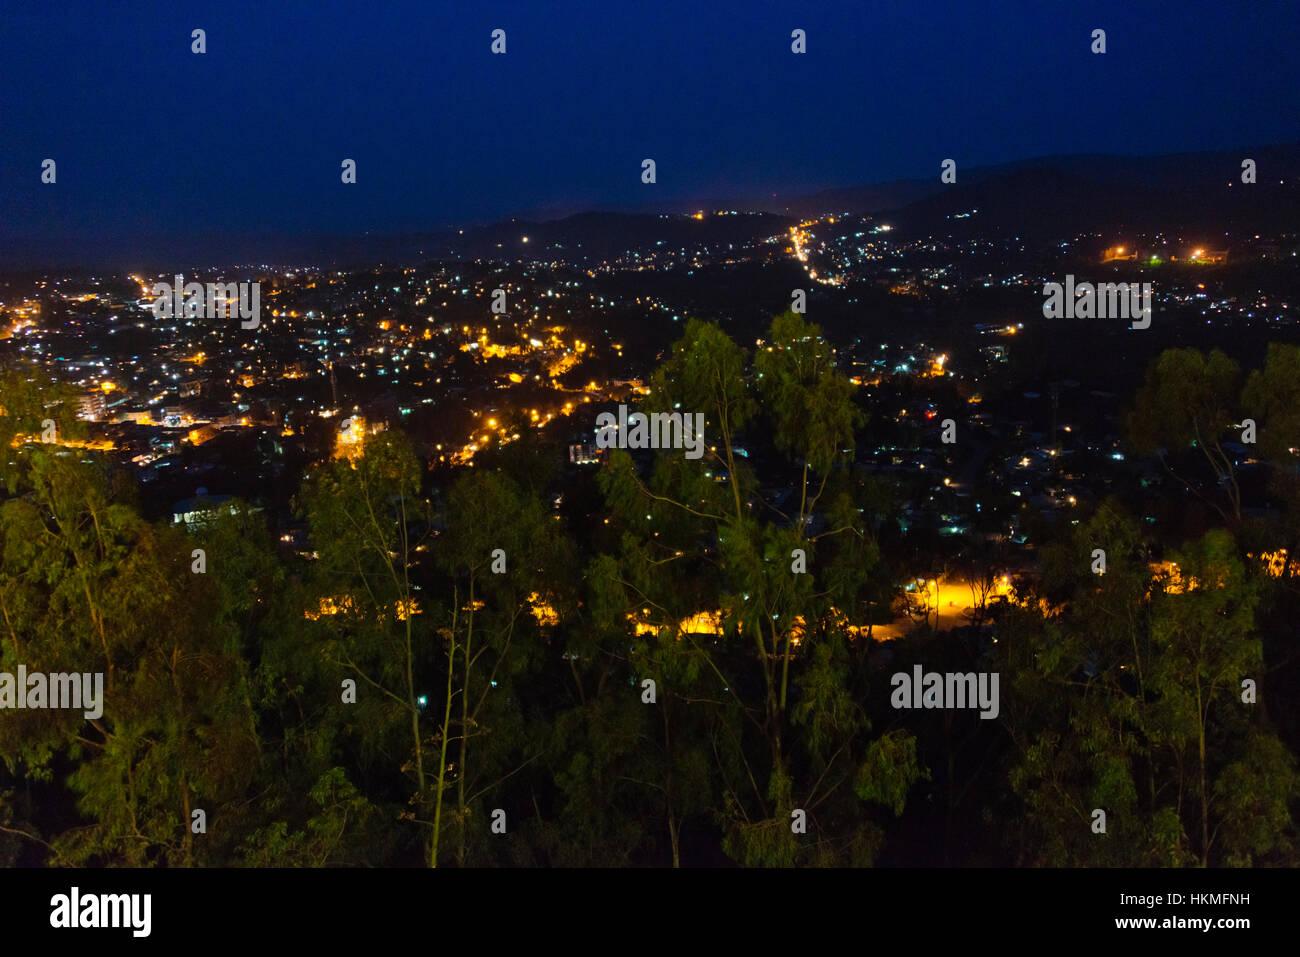 Night view of illuminated Gondar, Ethiopia - Stock Image